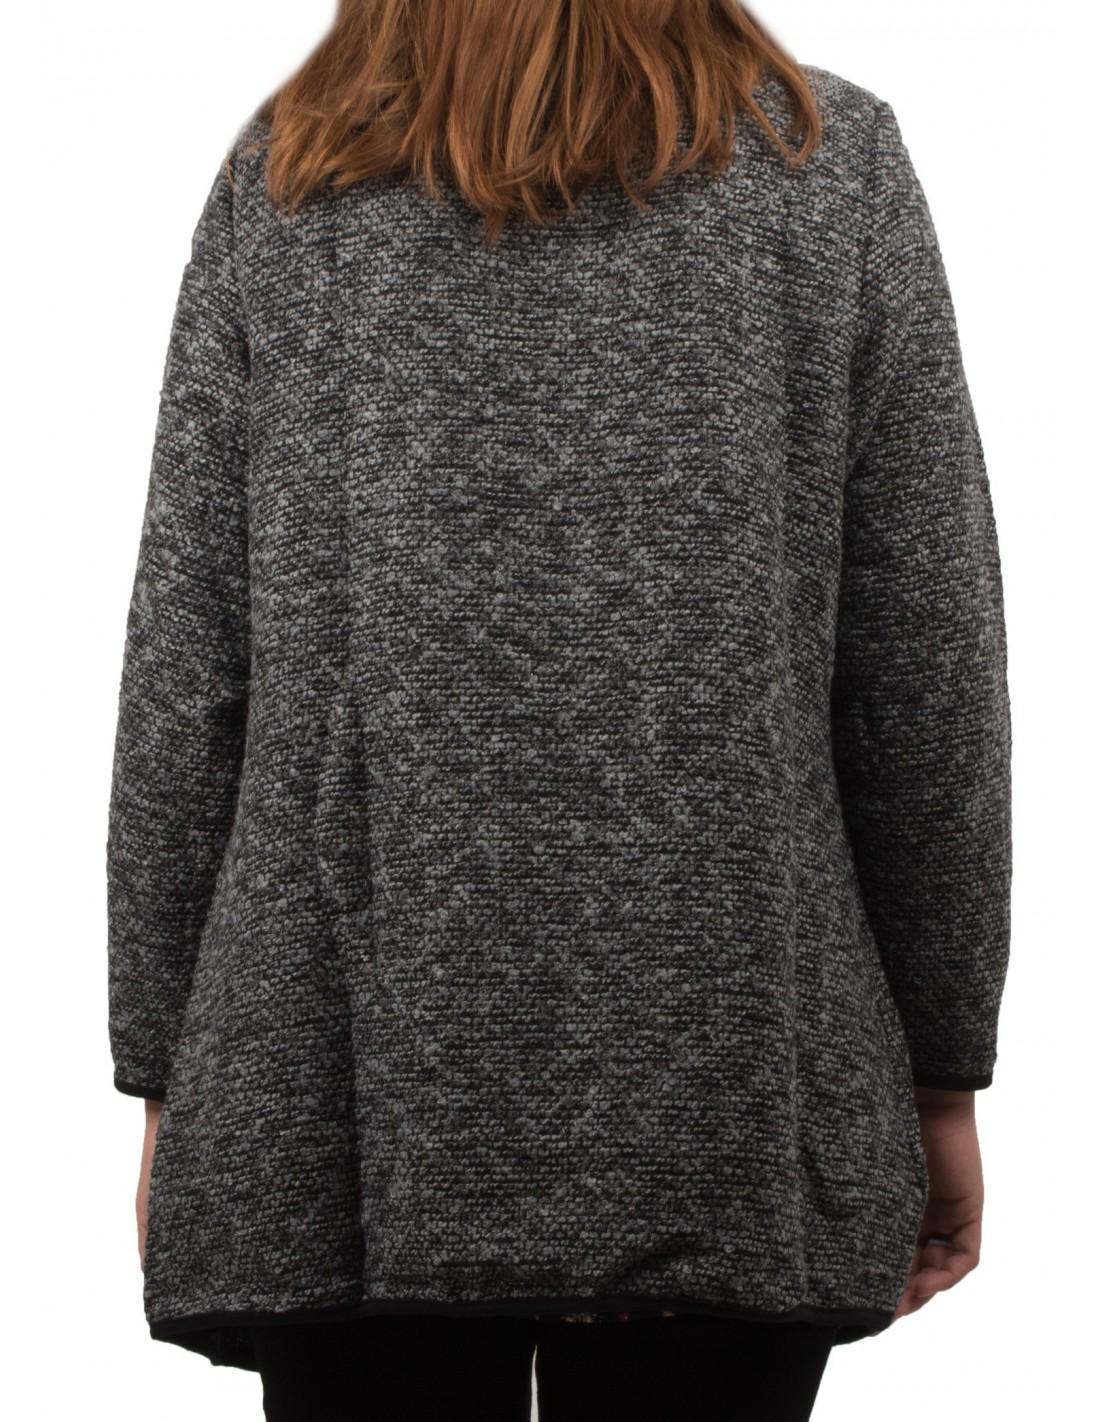 veste drapp e femme grande taille effet tweed bordeaux ou grise. Black Bedroom Furniture Sets. Home Design Ideas